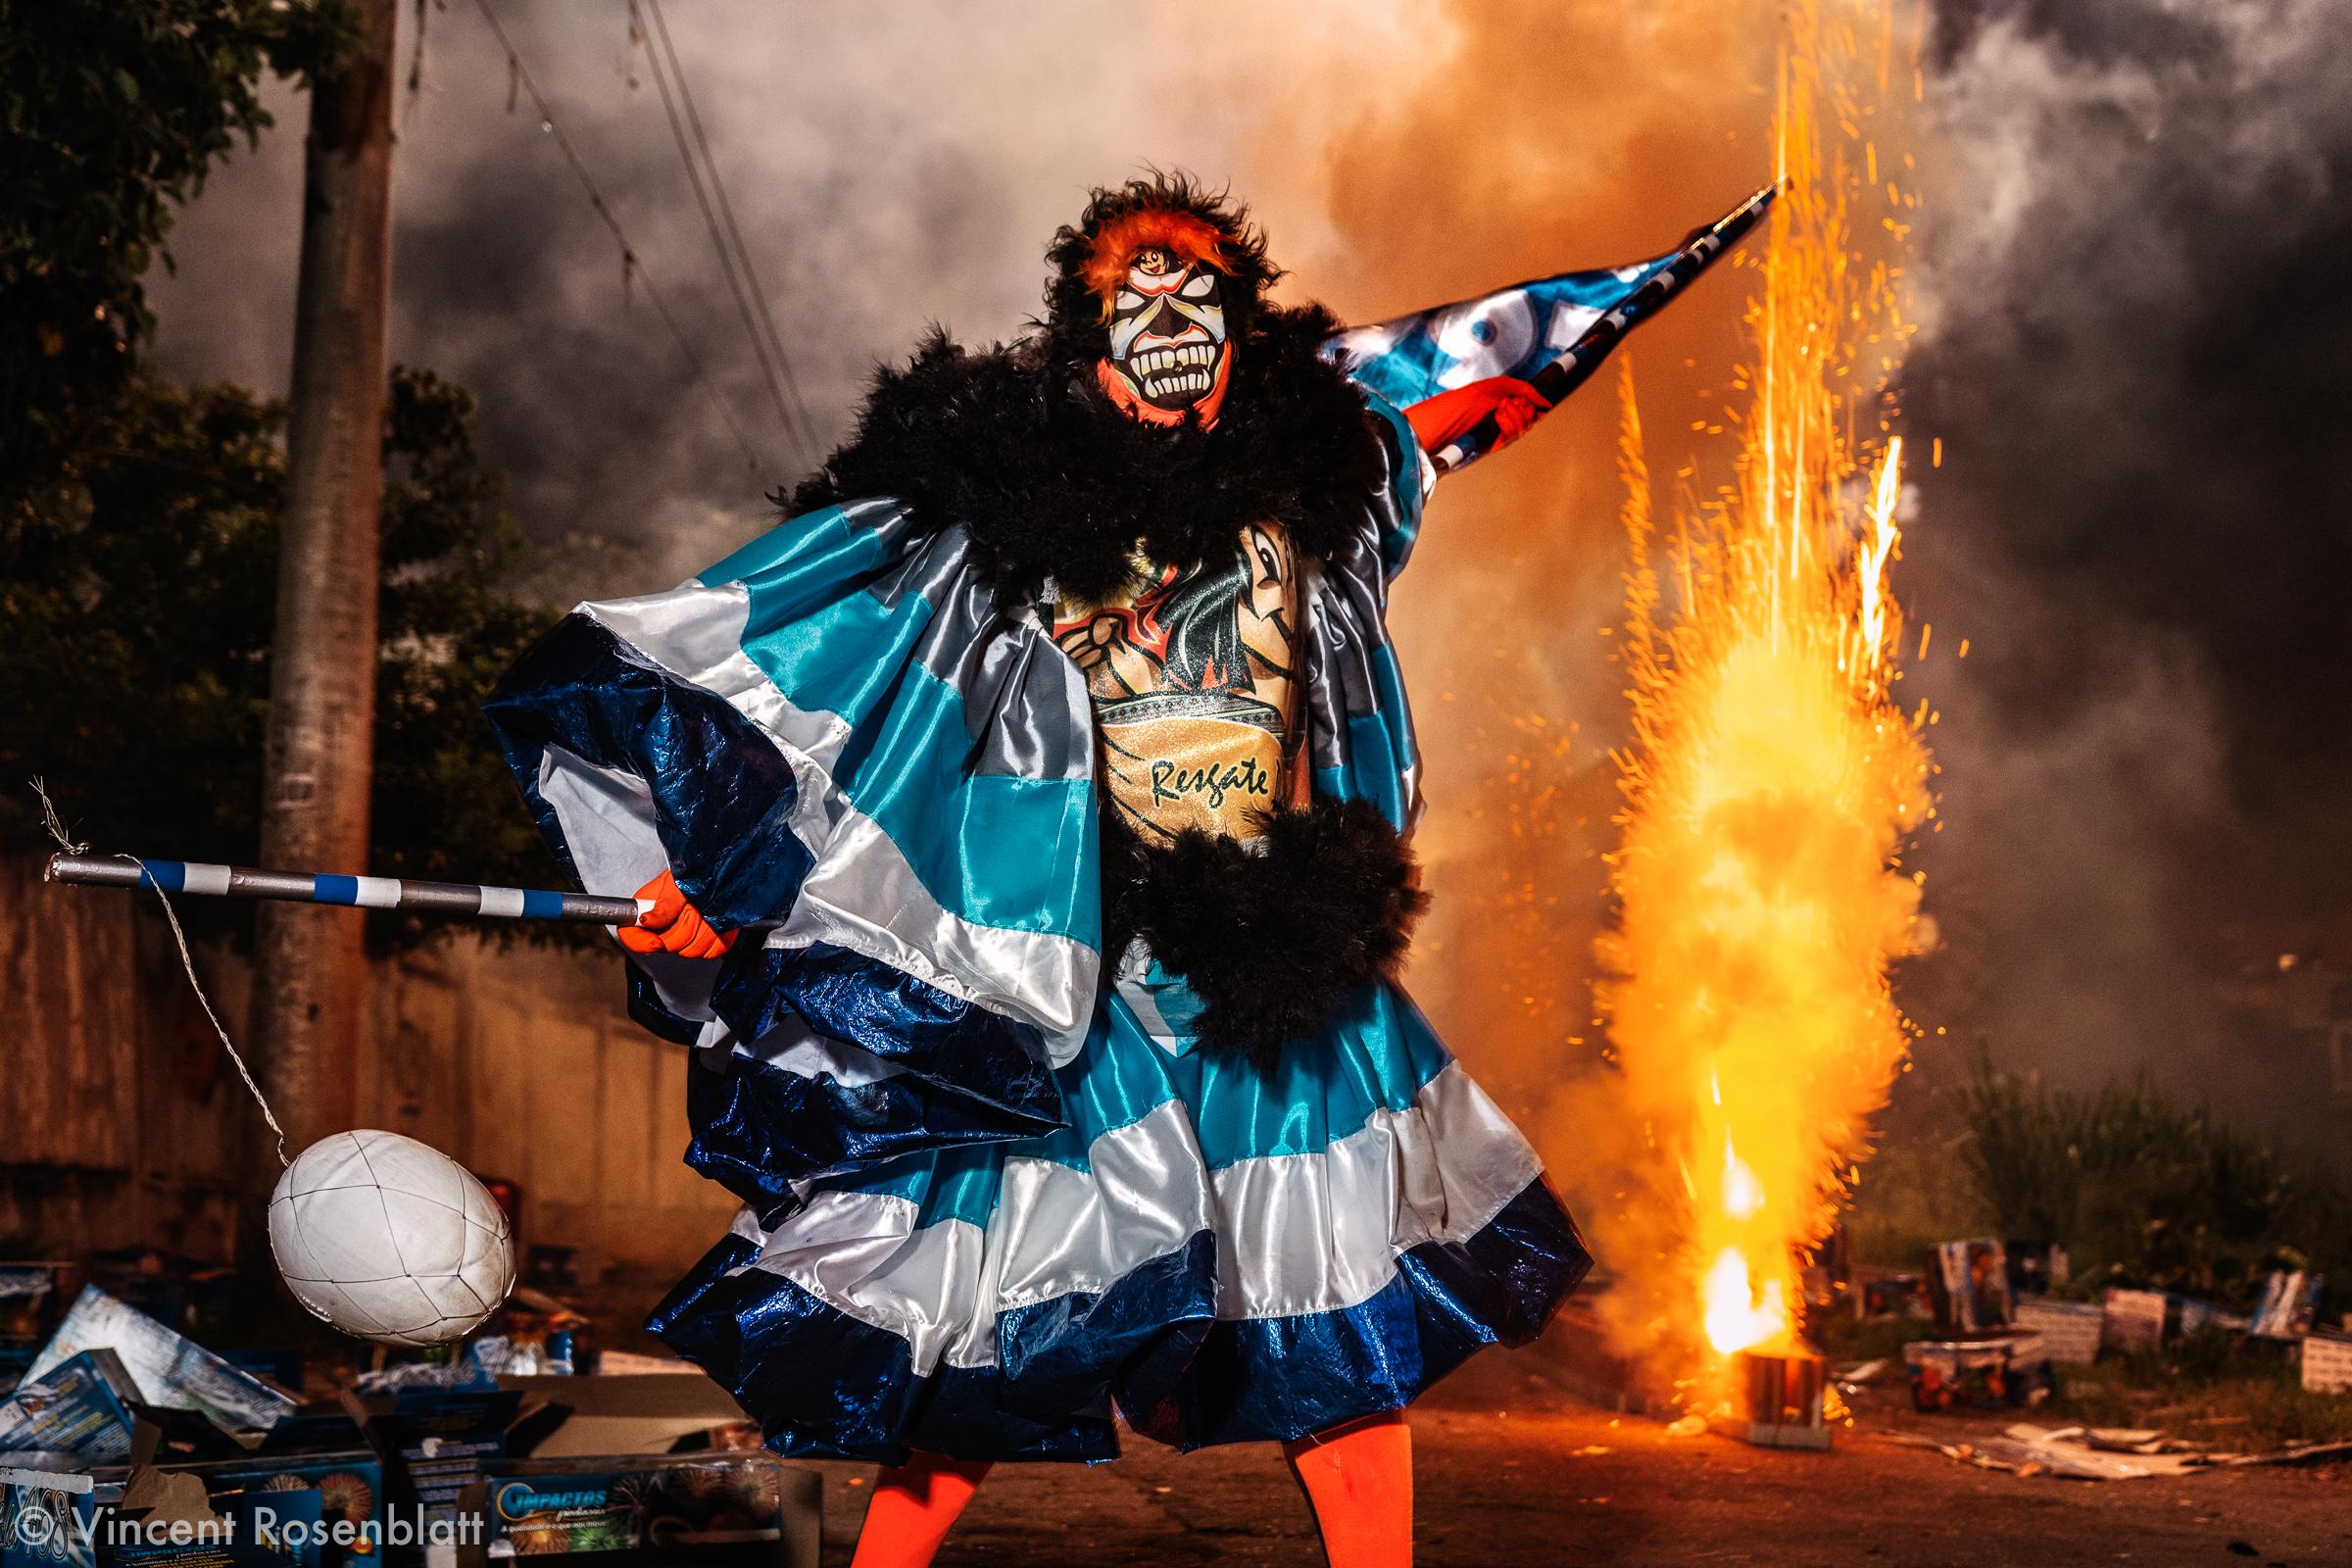 """Havita"" group of Bate-Bola, Oswaldo Cruz, North Zone of Rio de Janeiro, Carnival 2018."